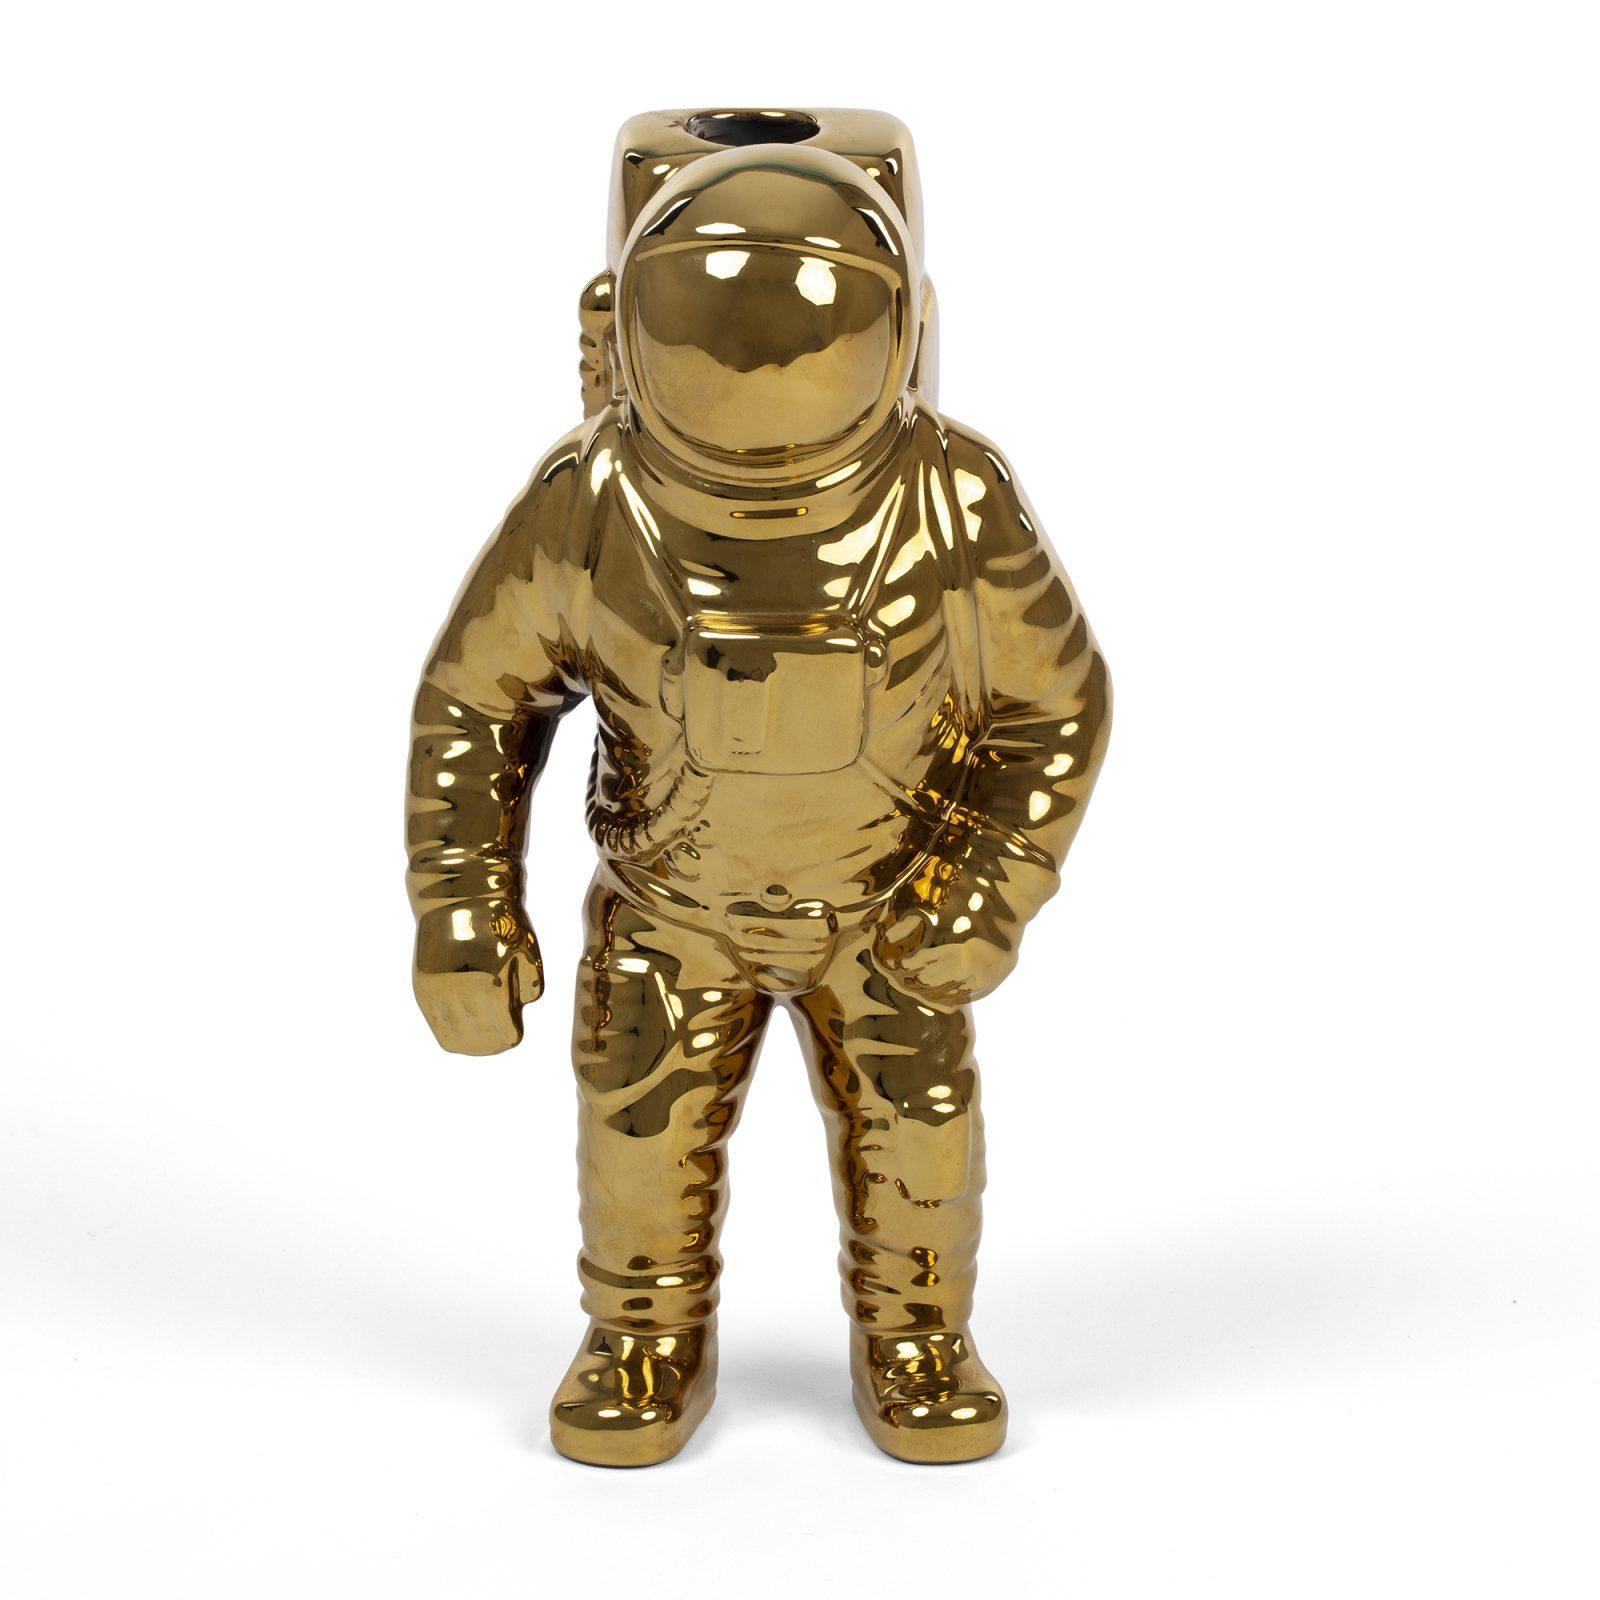 starman-vase-seletti-diesel-gold-2